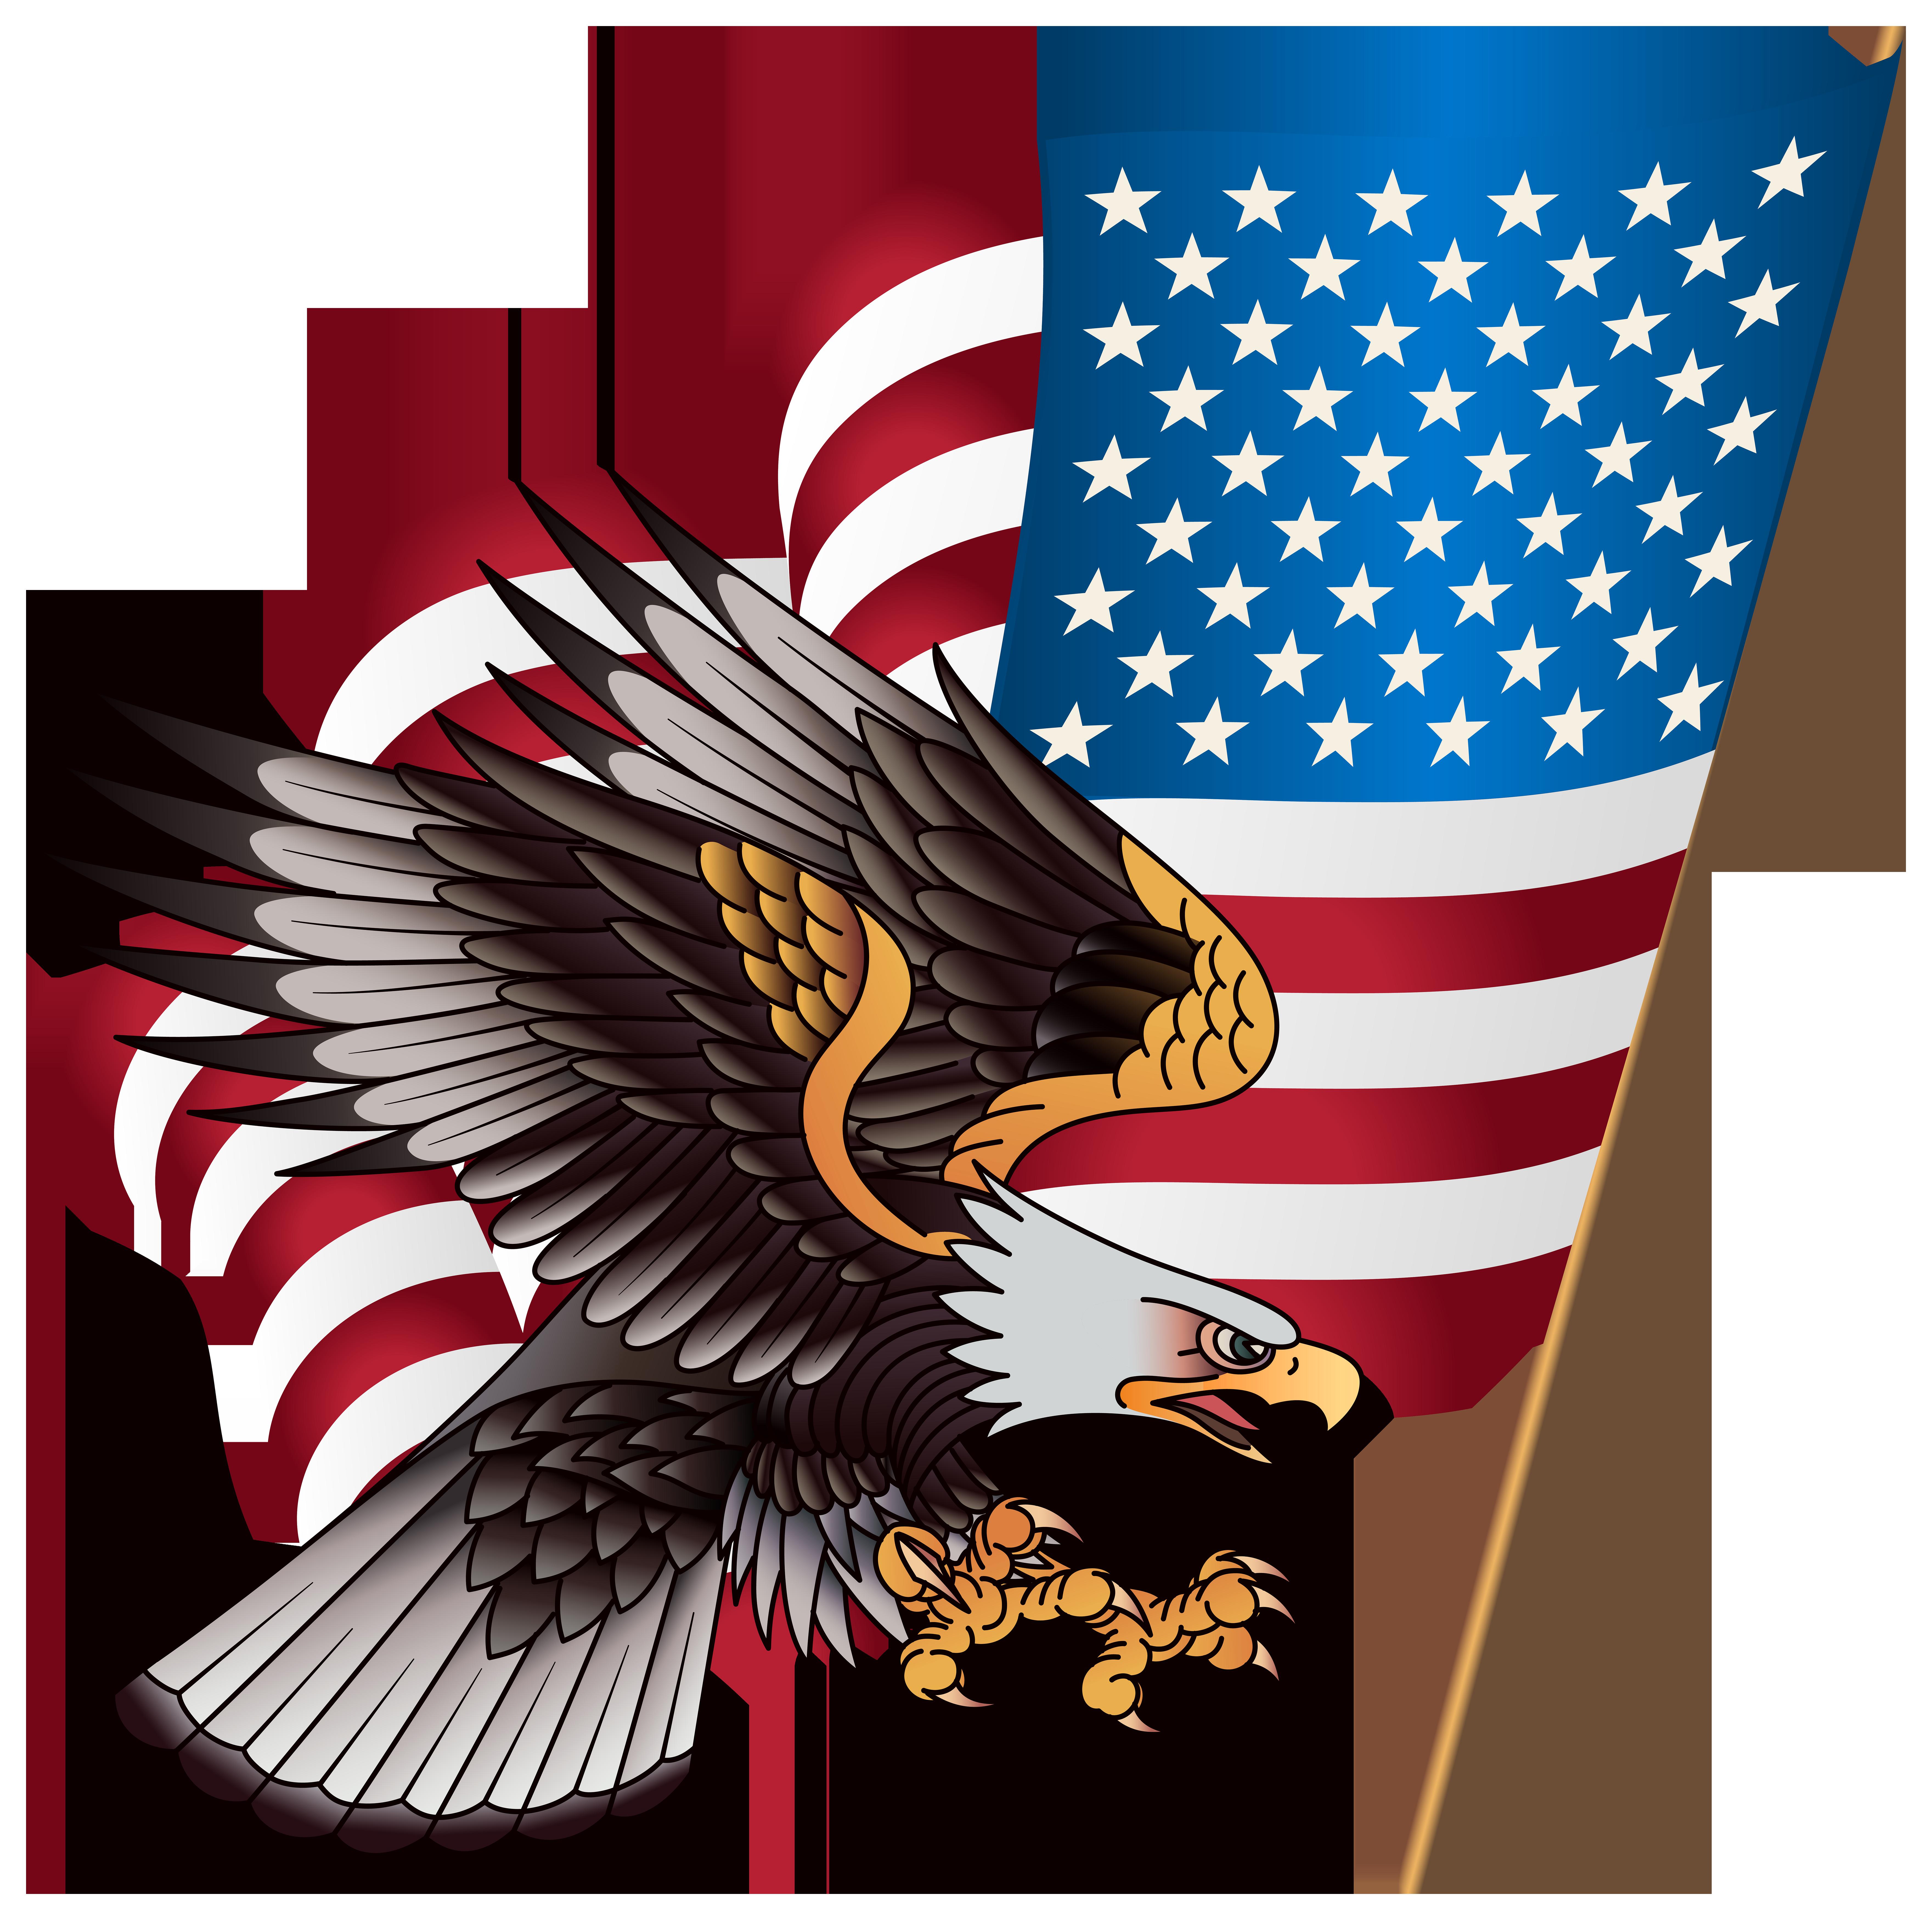 United states clipart american flag eagle, United states ...